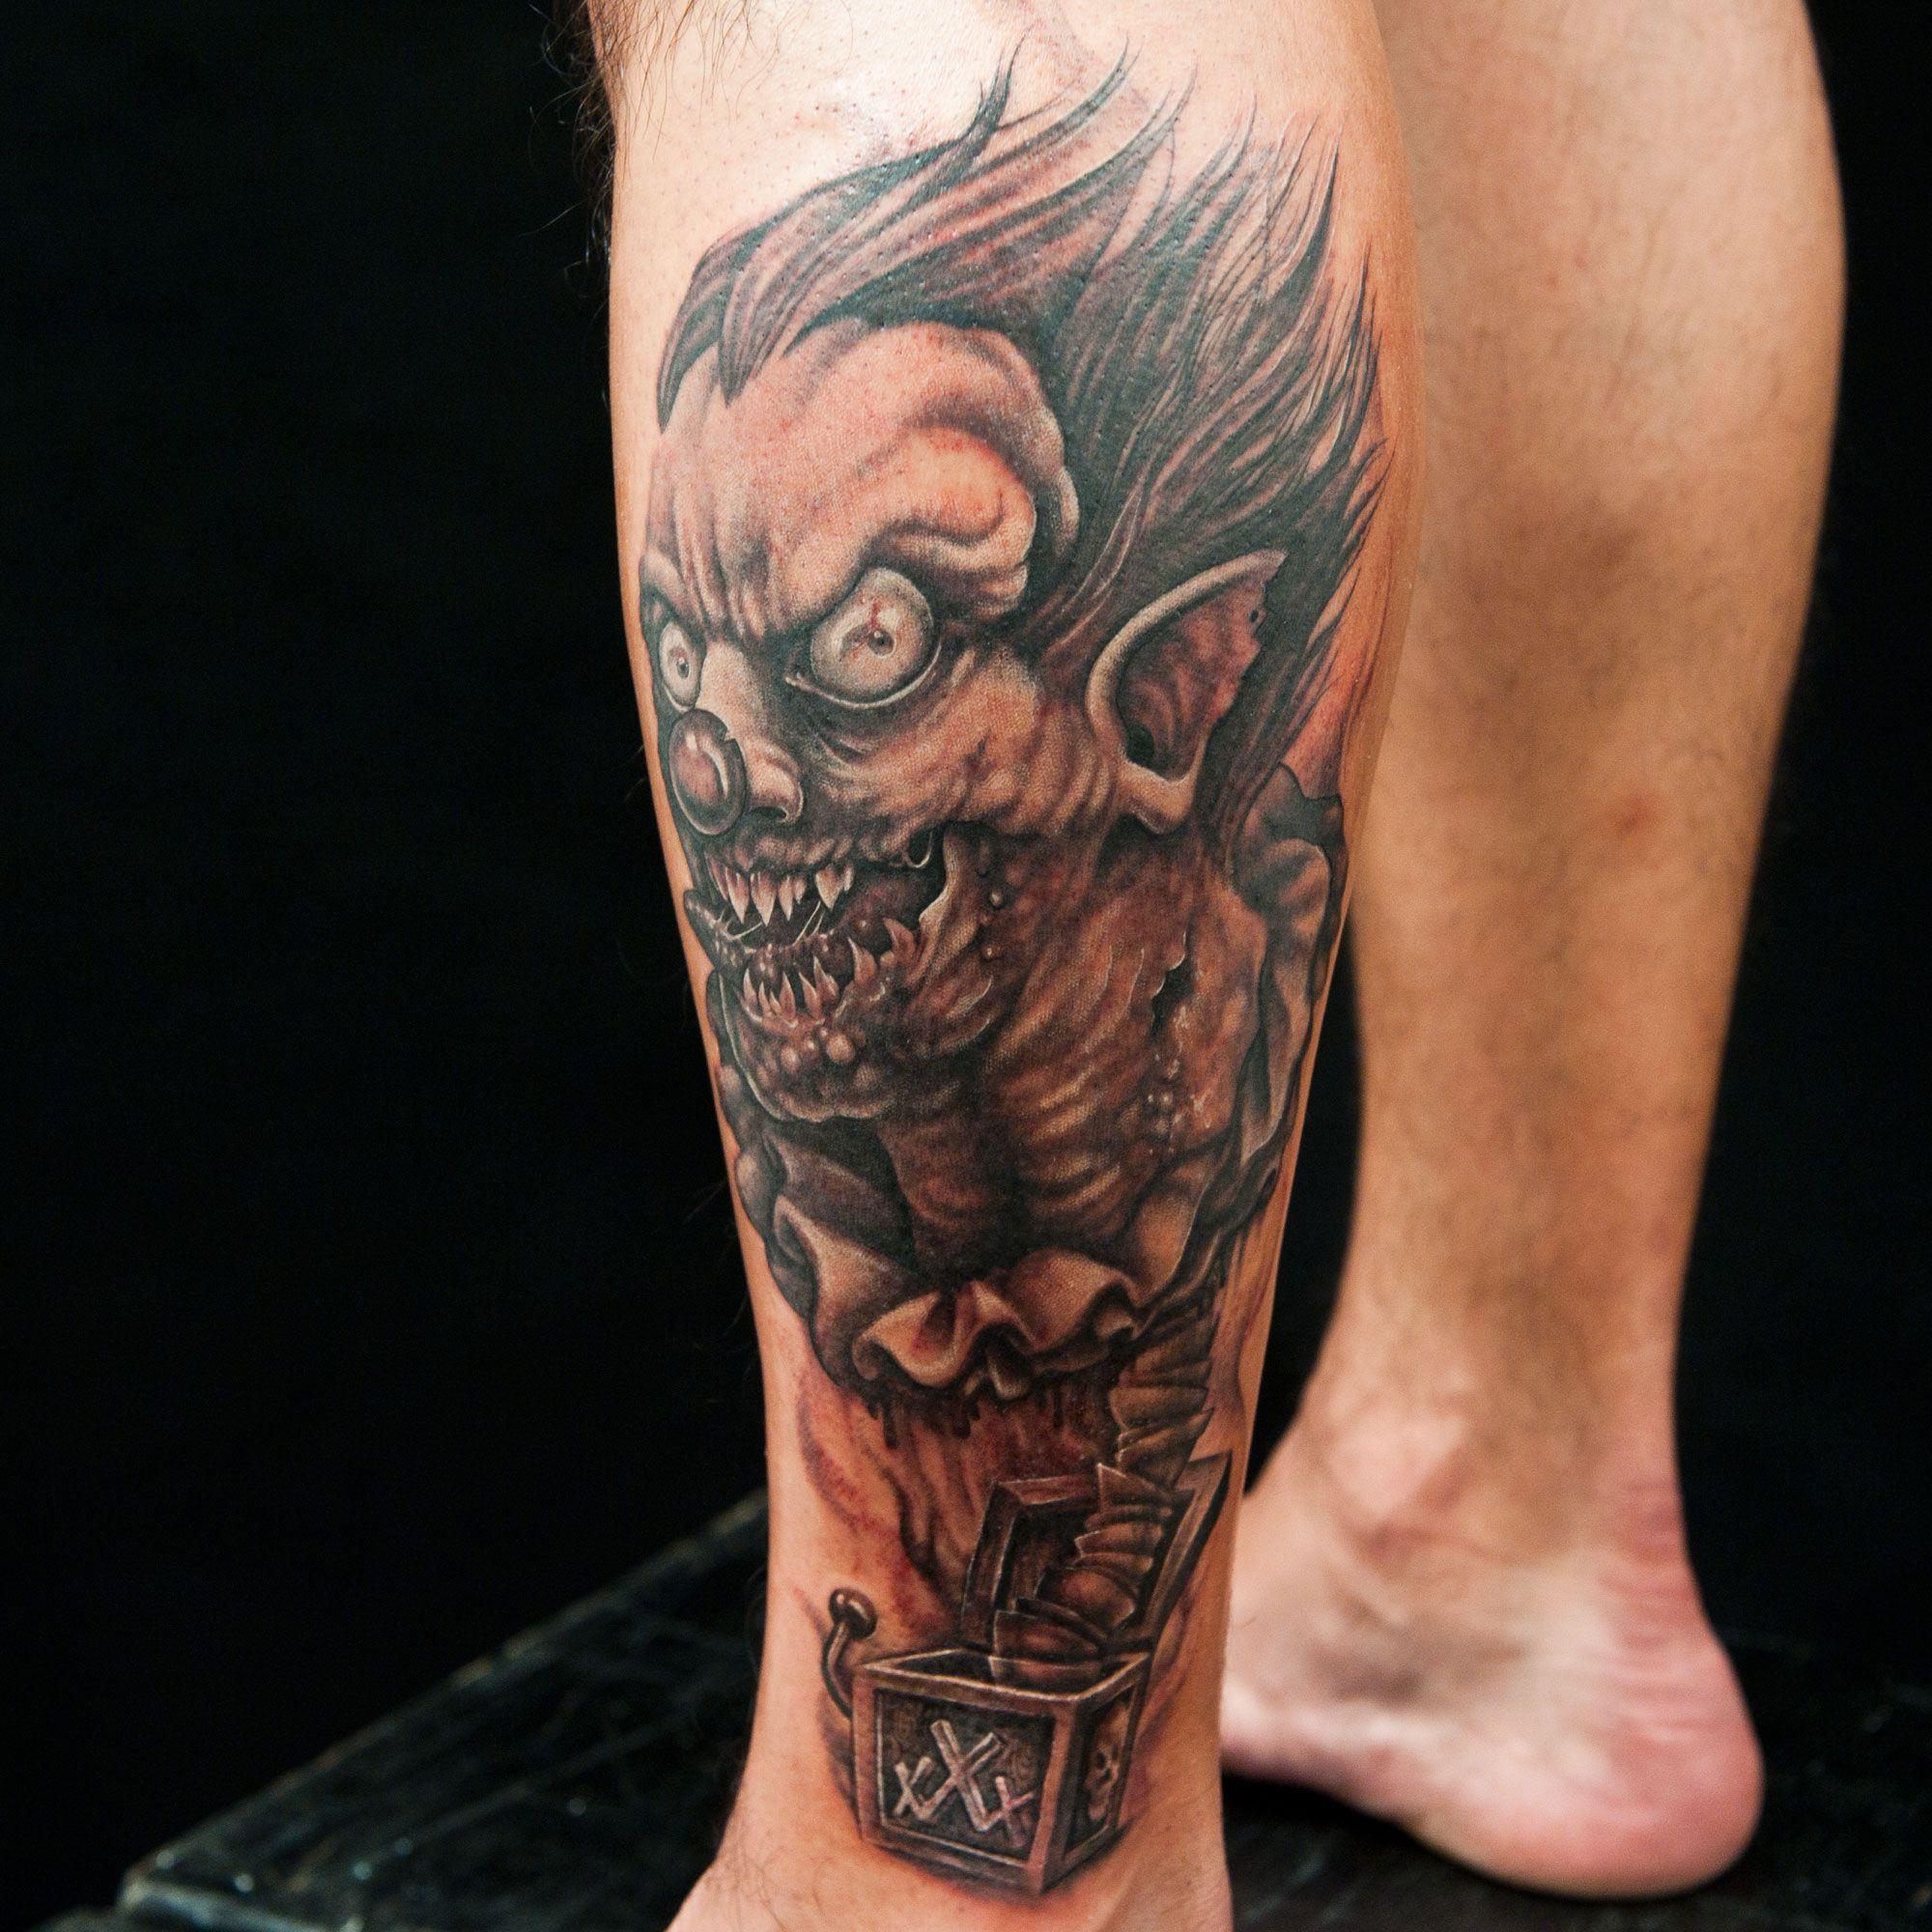 Horror ink master for Ink ink tattoo